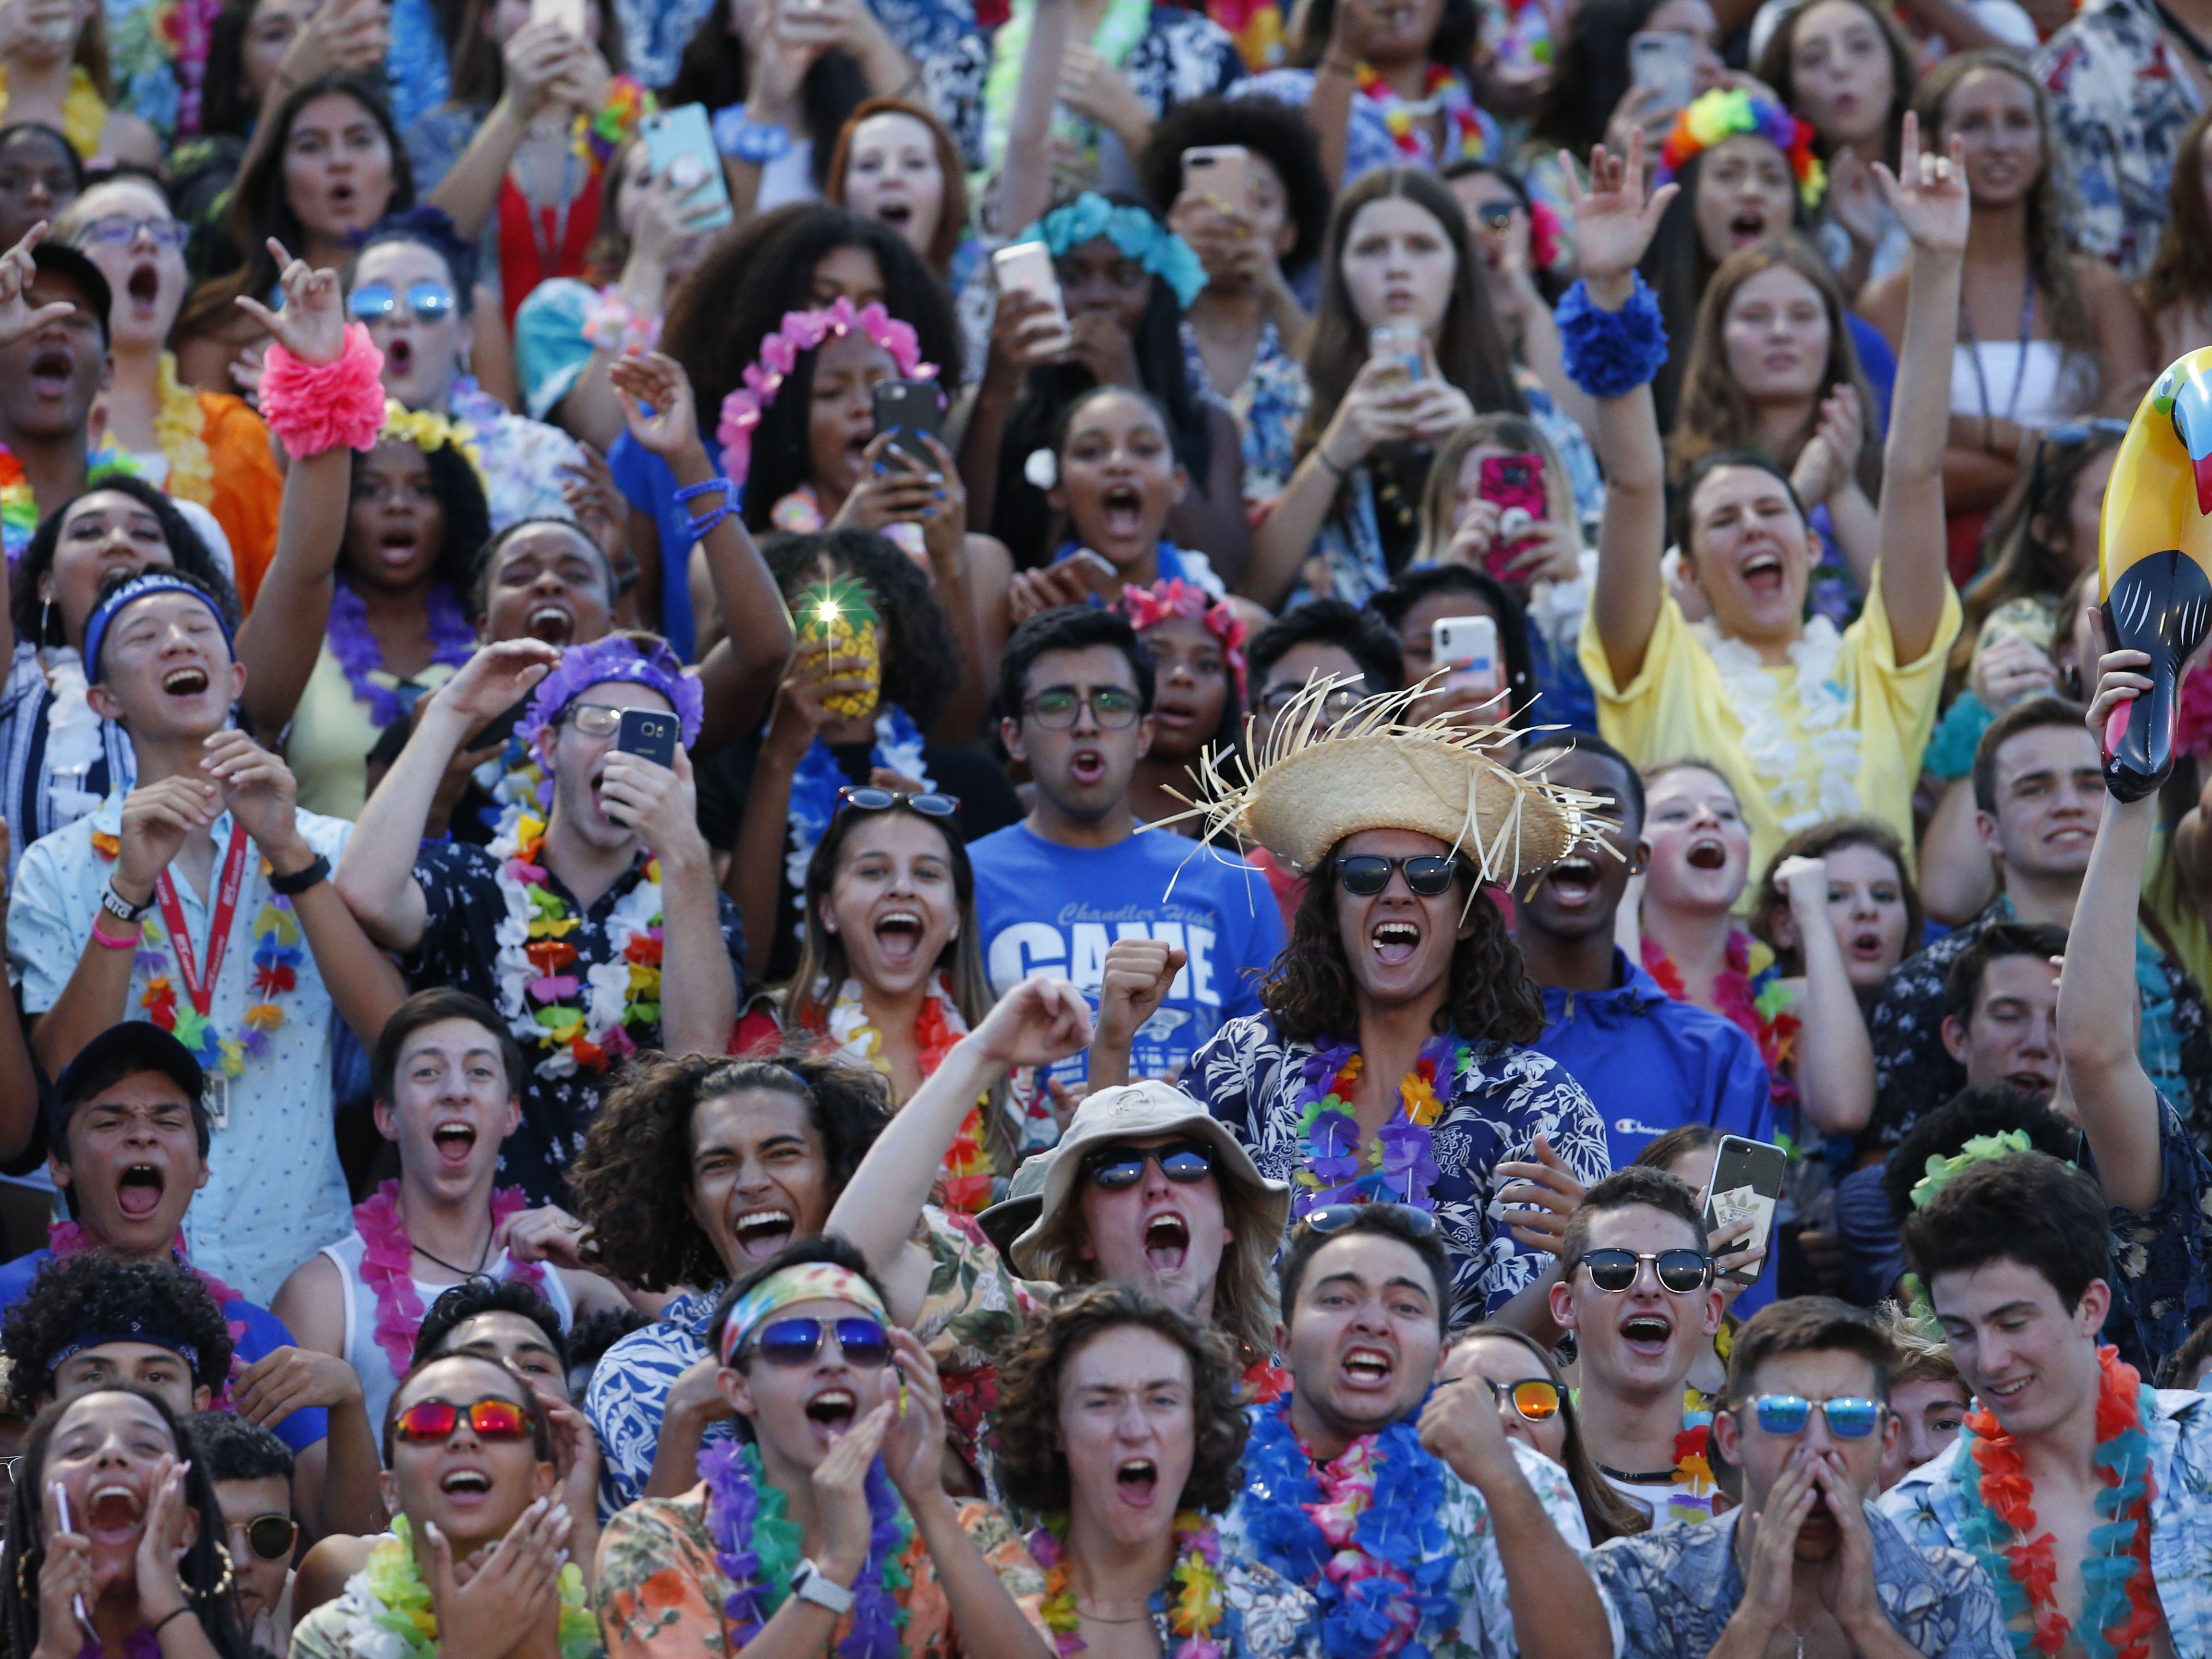 Chandler fans cheer during a high school football game against Queen Creek at Chandler High on August 24, 2018. #azhsfb